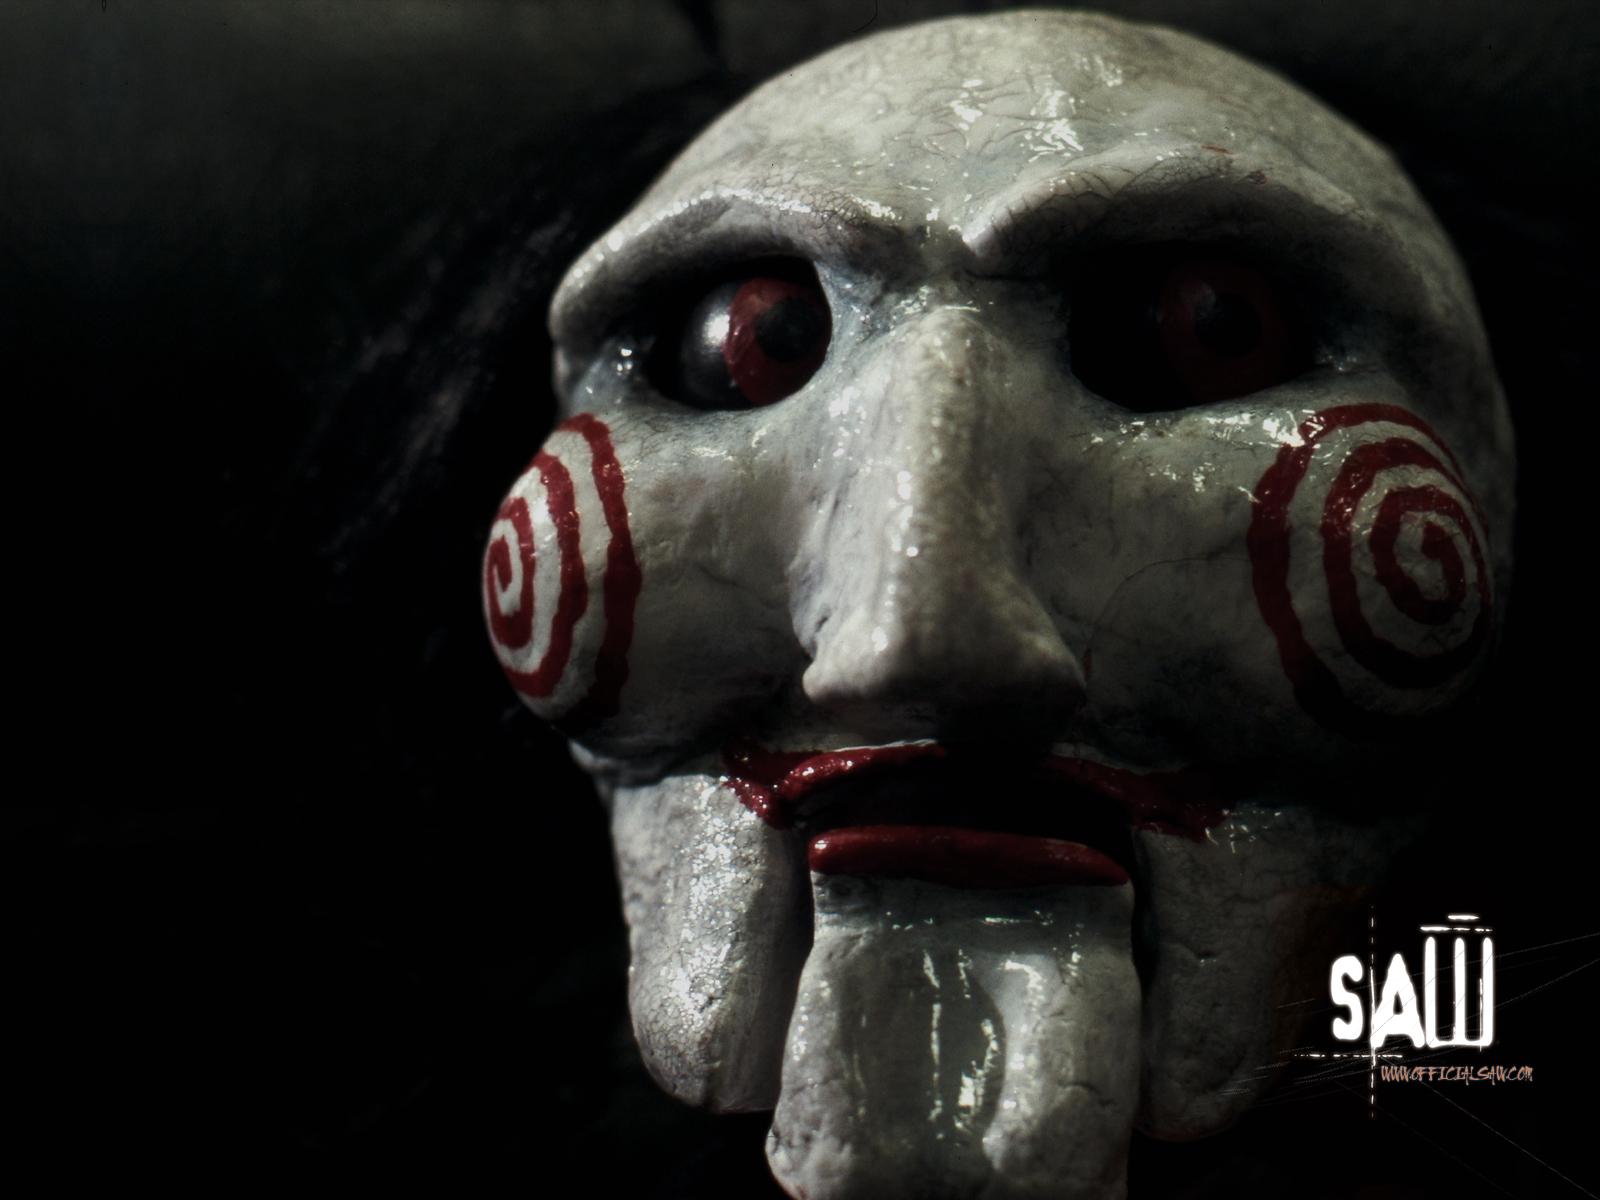 Saw Wallpaper   Horror Movies Wallpaper 8767334 fanclubs 1600x1200